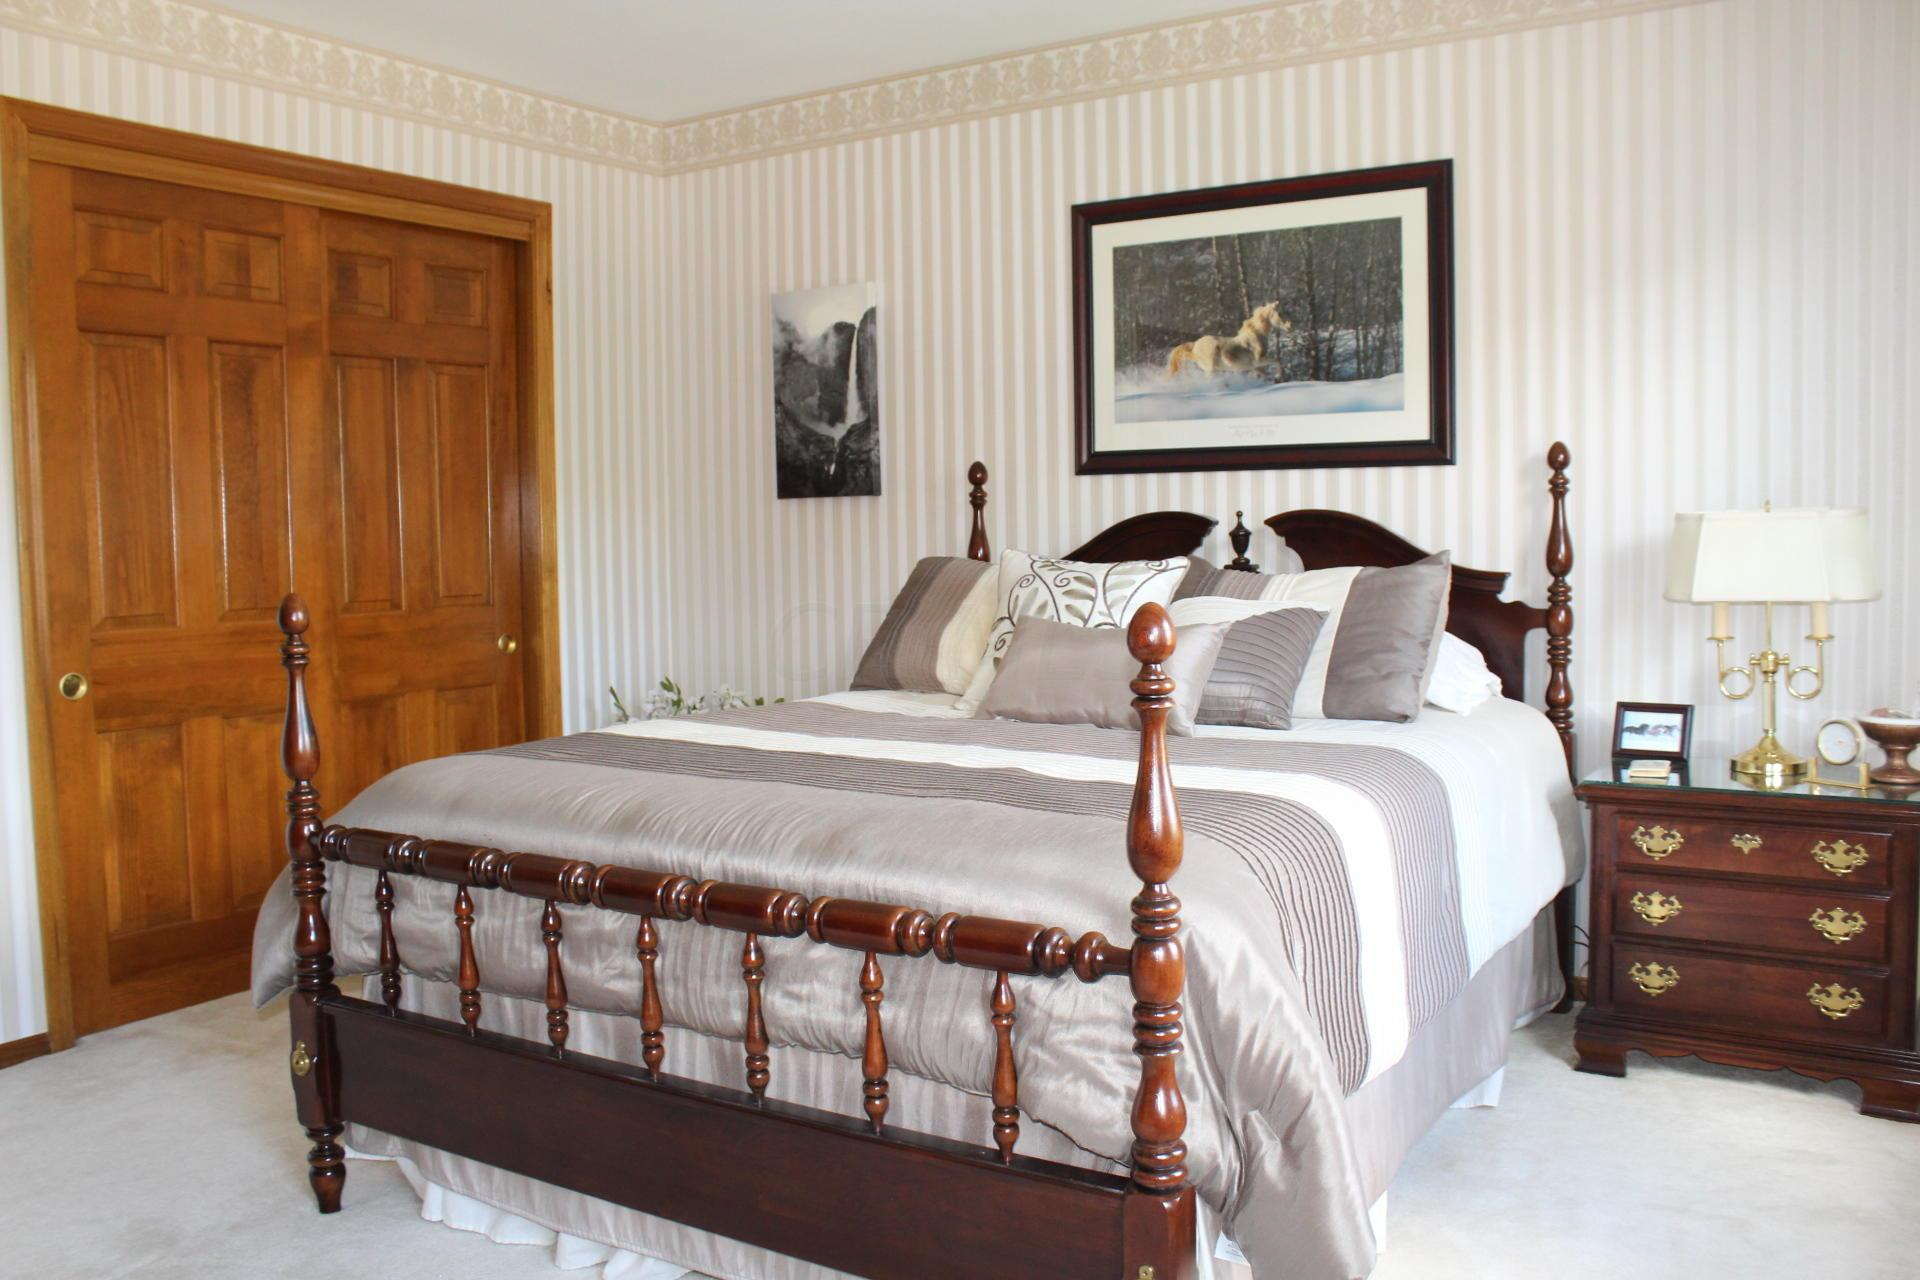 8063 Inistork Drive, Dublin, Ohio 43017, 4 Bedrooms Bedrooms, ,3 BathroomsBathrooms,Residential,For Sale,Inistork,220039546